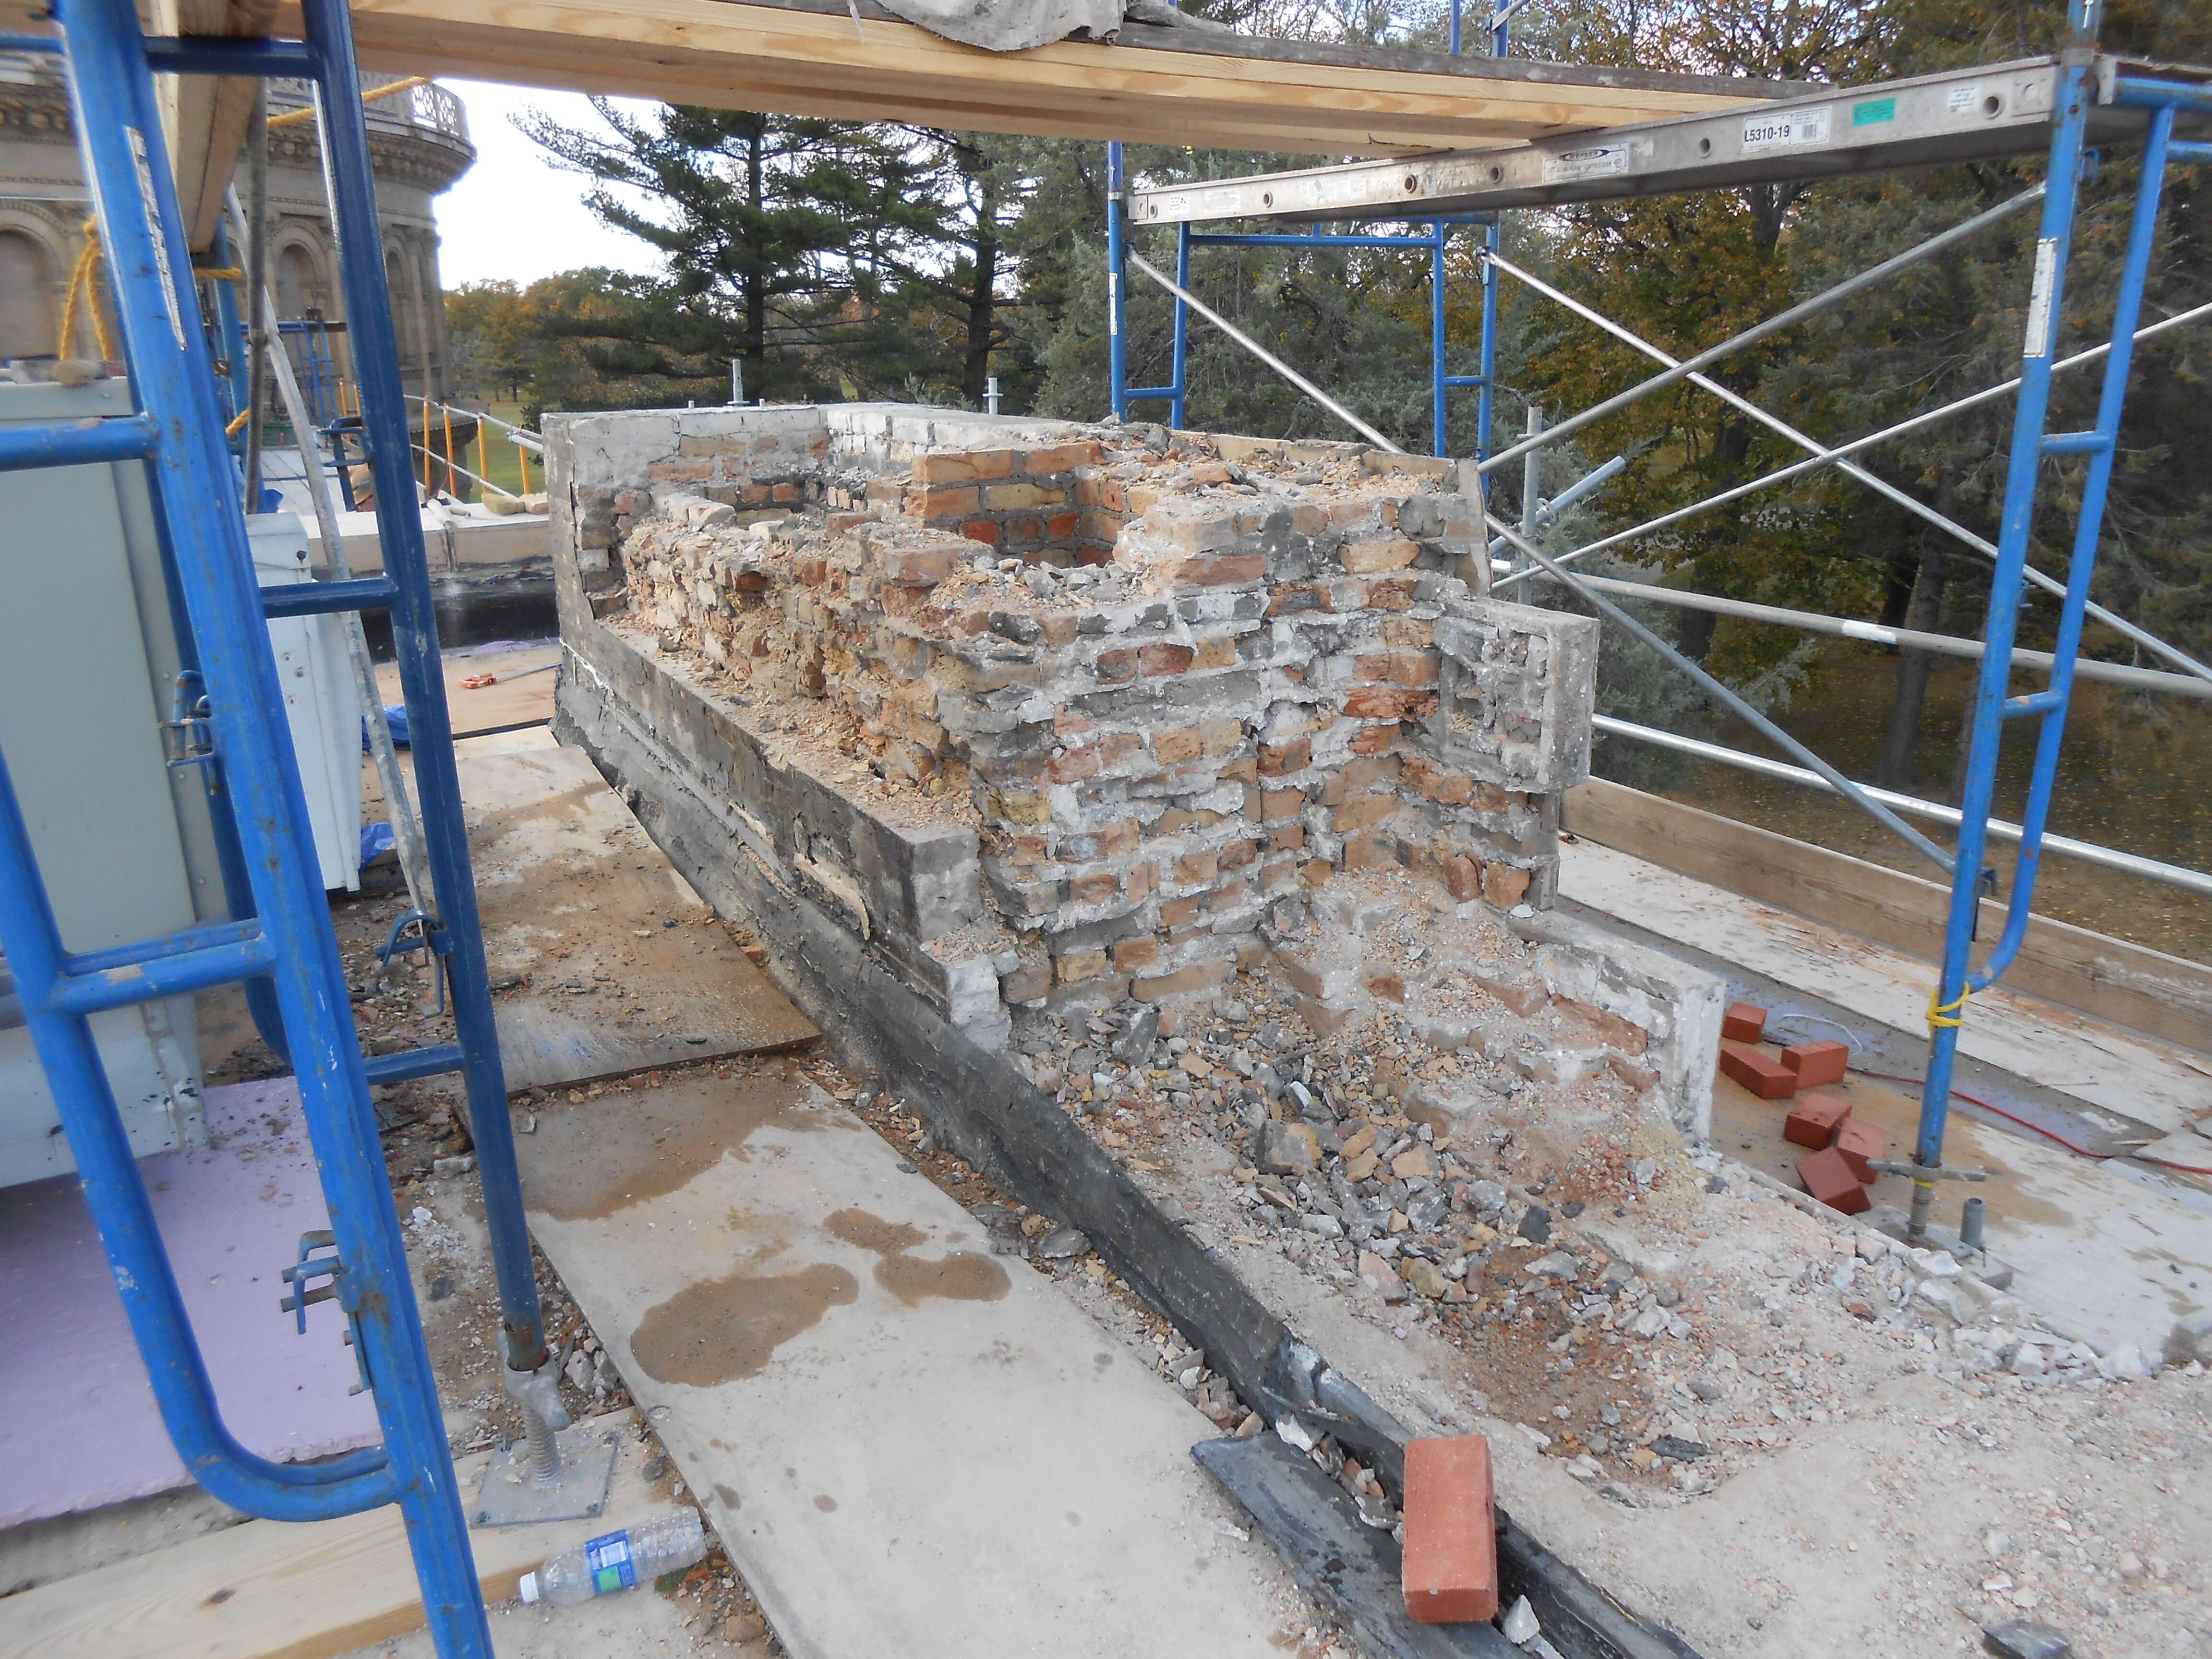 Walls Restoration Work Yerkes Observatory, Williams Bay WI